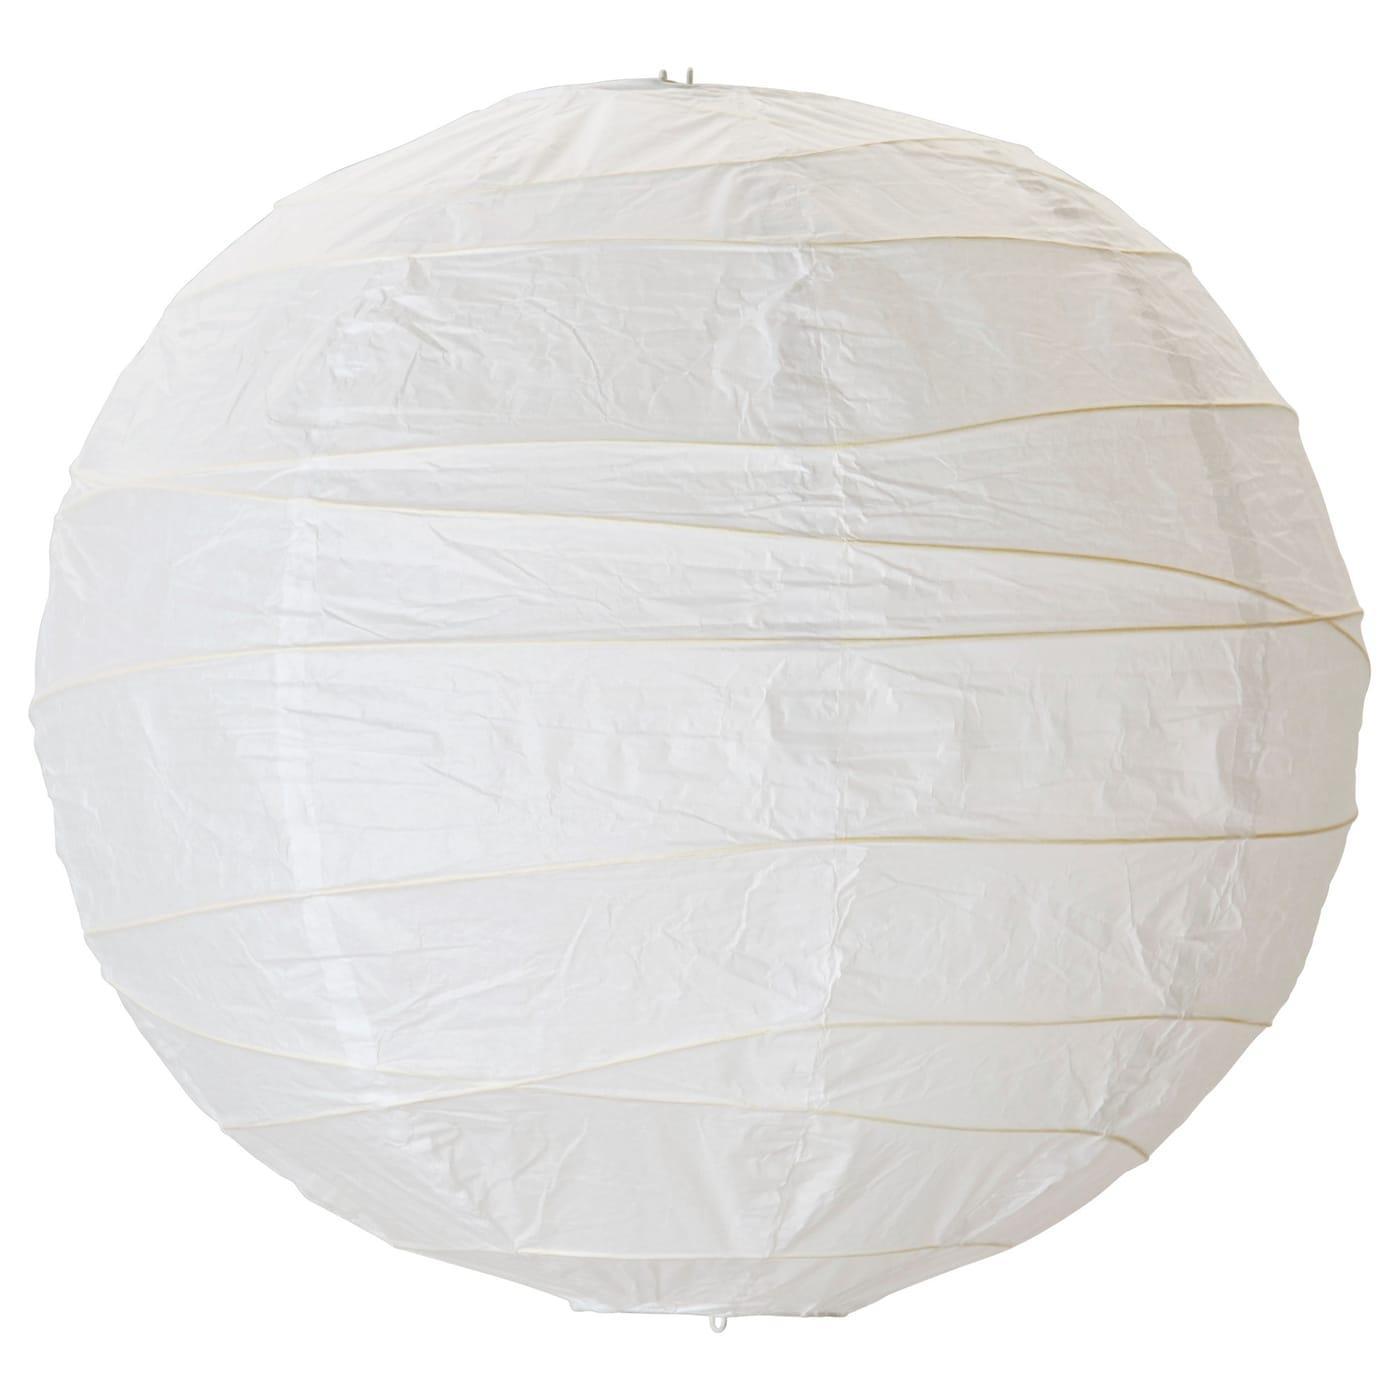 Lampenschirm Weiß Ikea